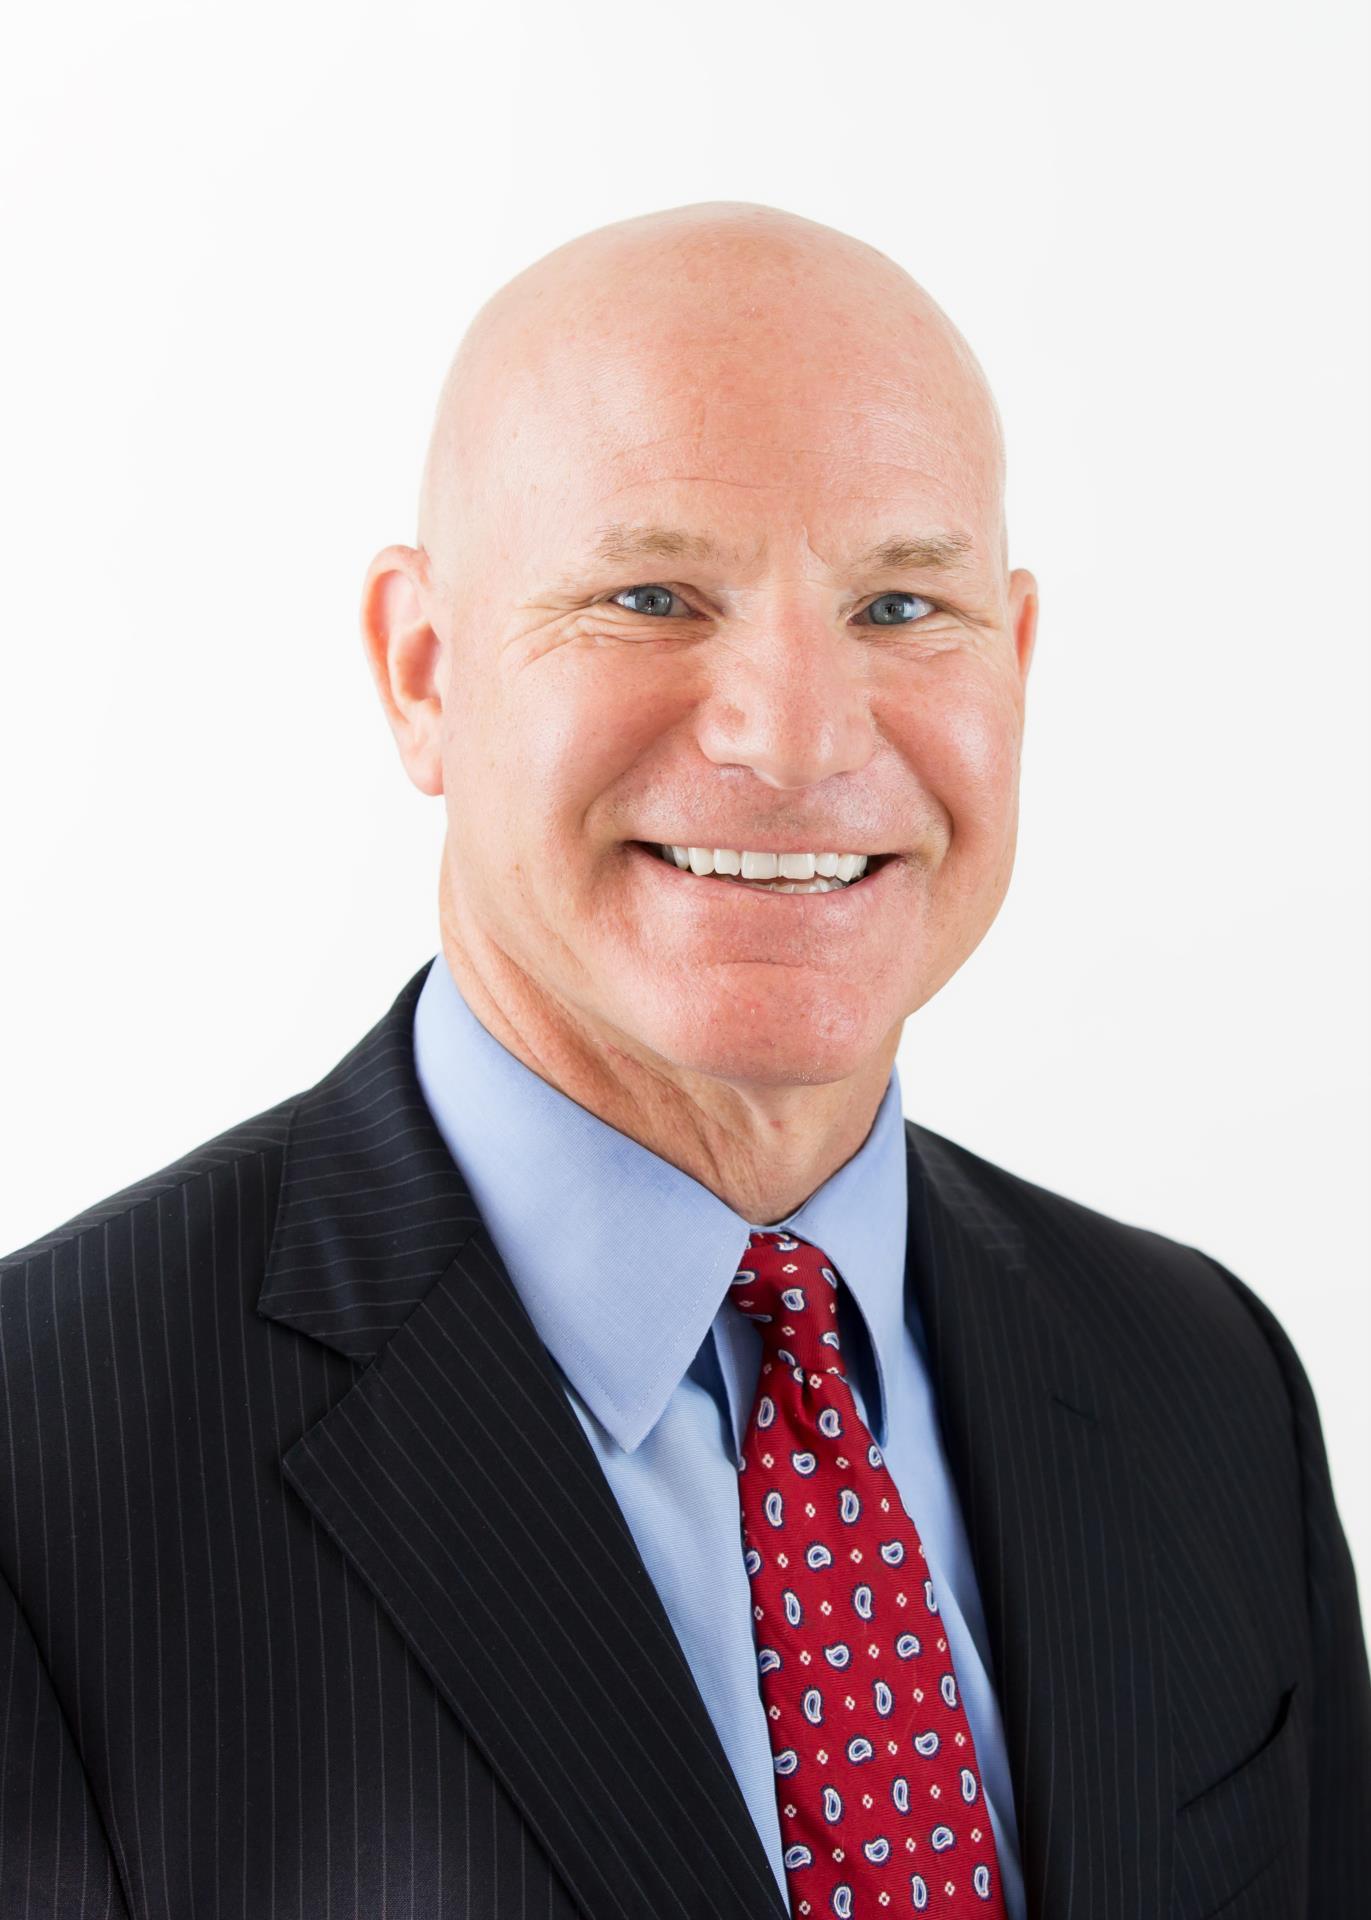 Dr. Mark Ault